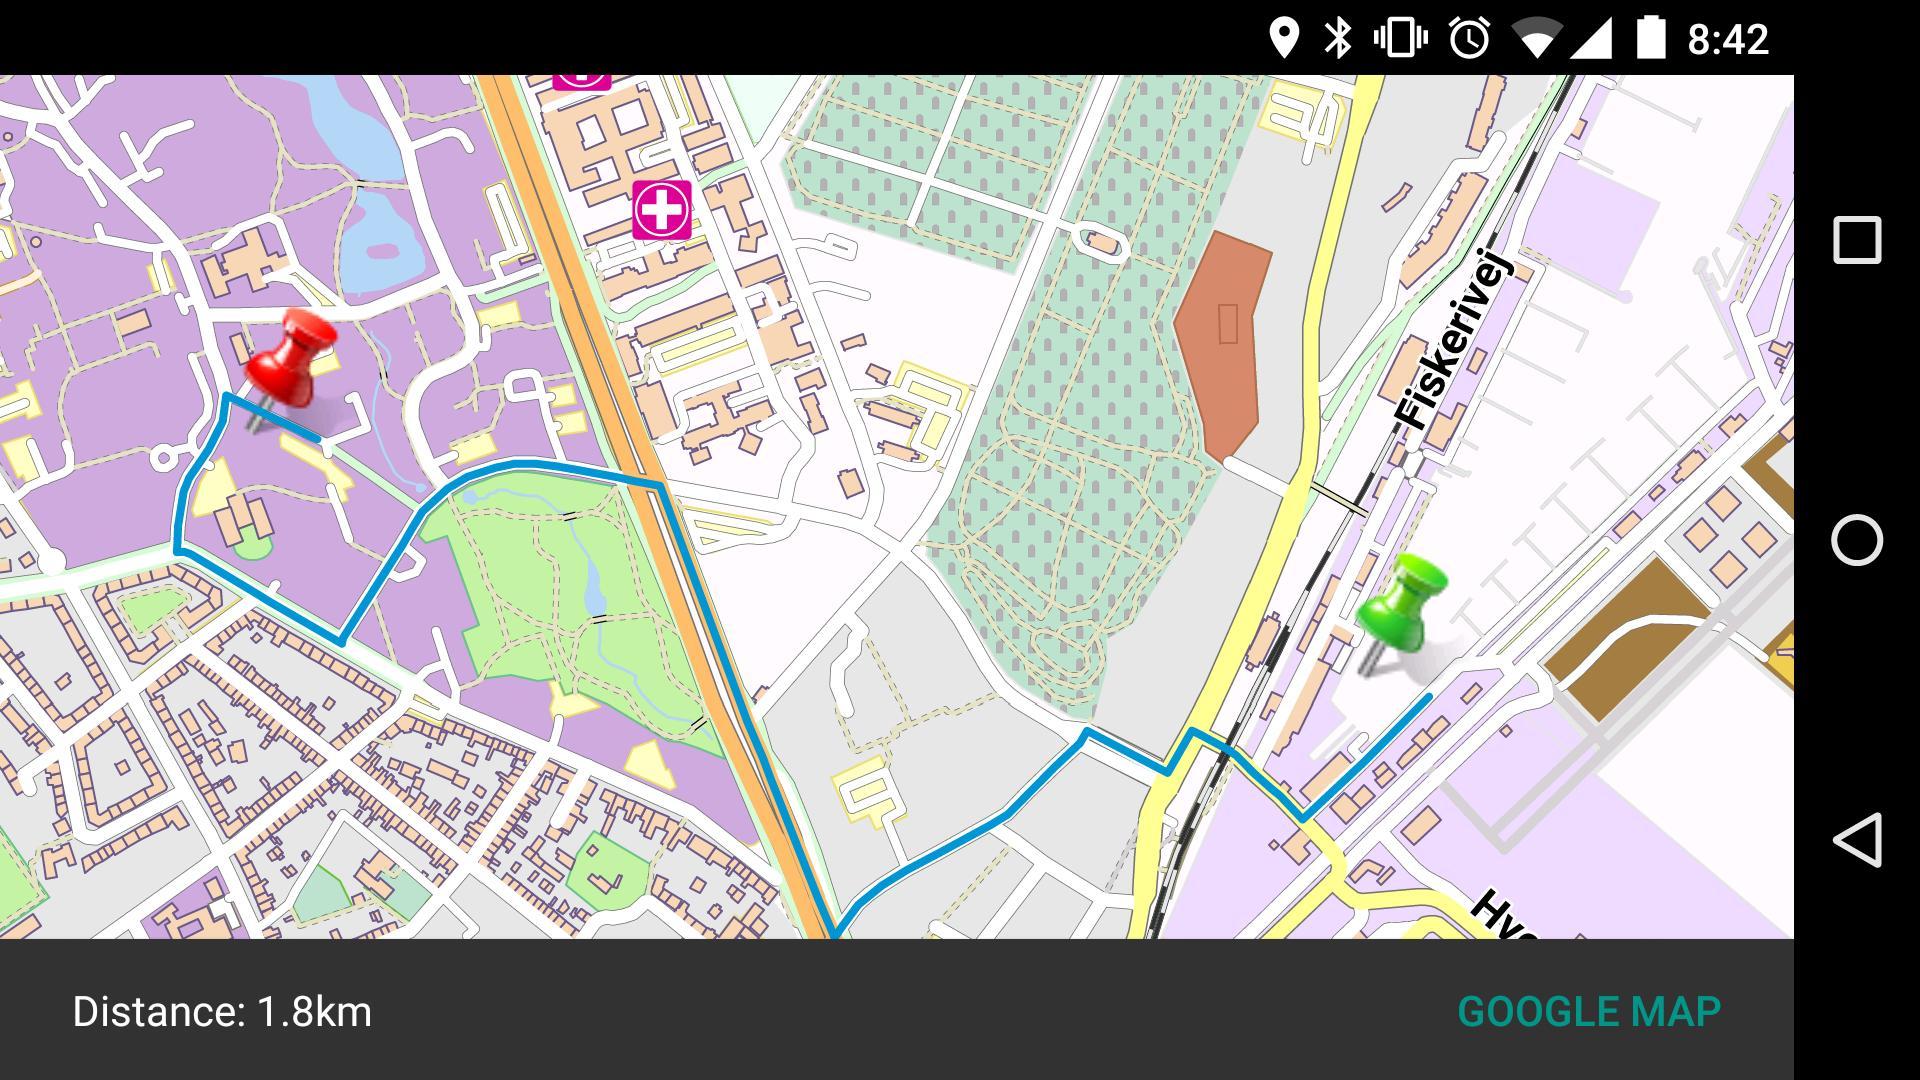 Khartoum-Sudan Offline Map for Android - APK Download on